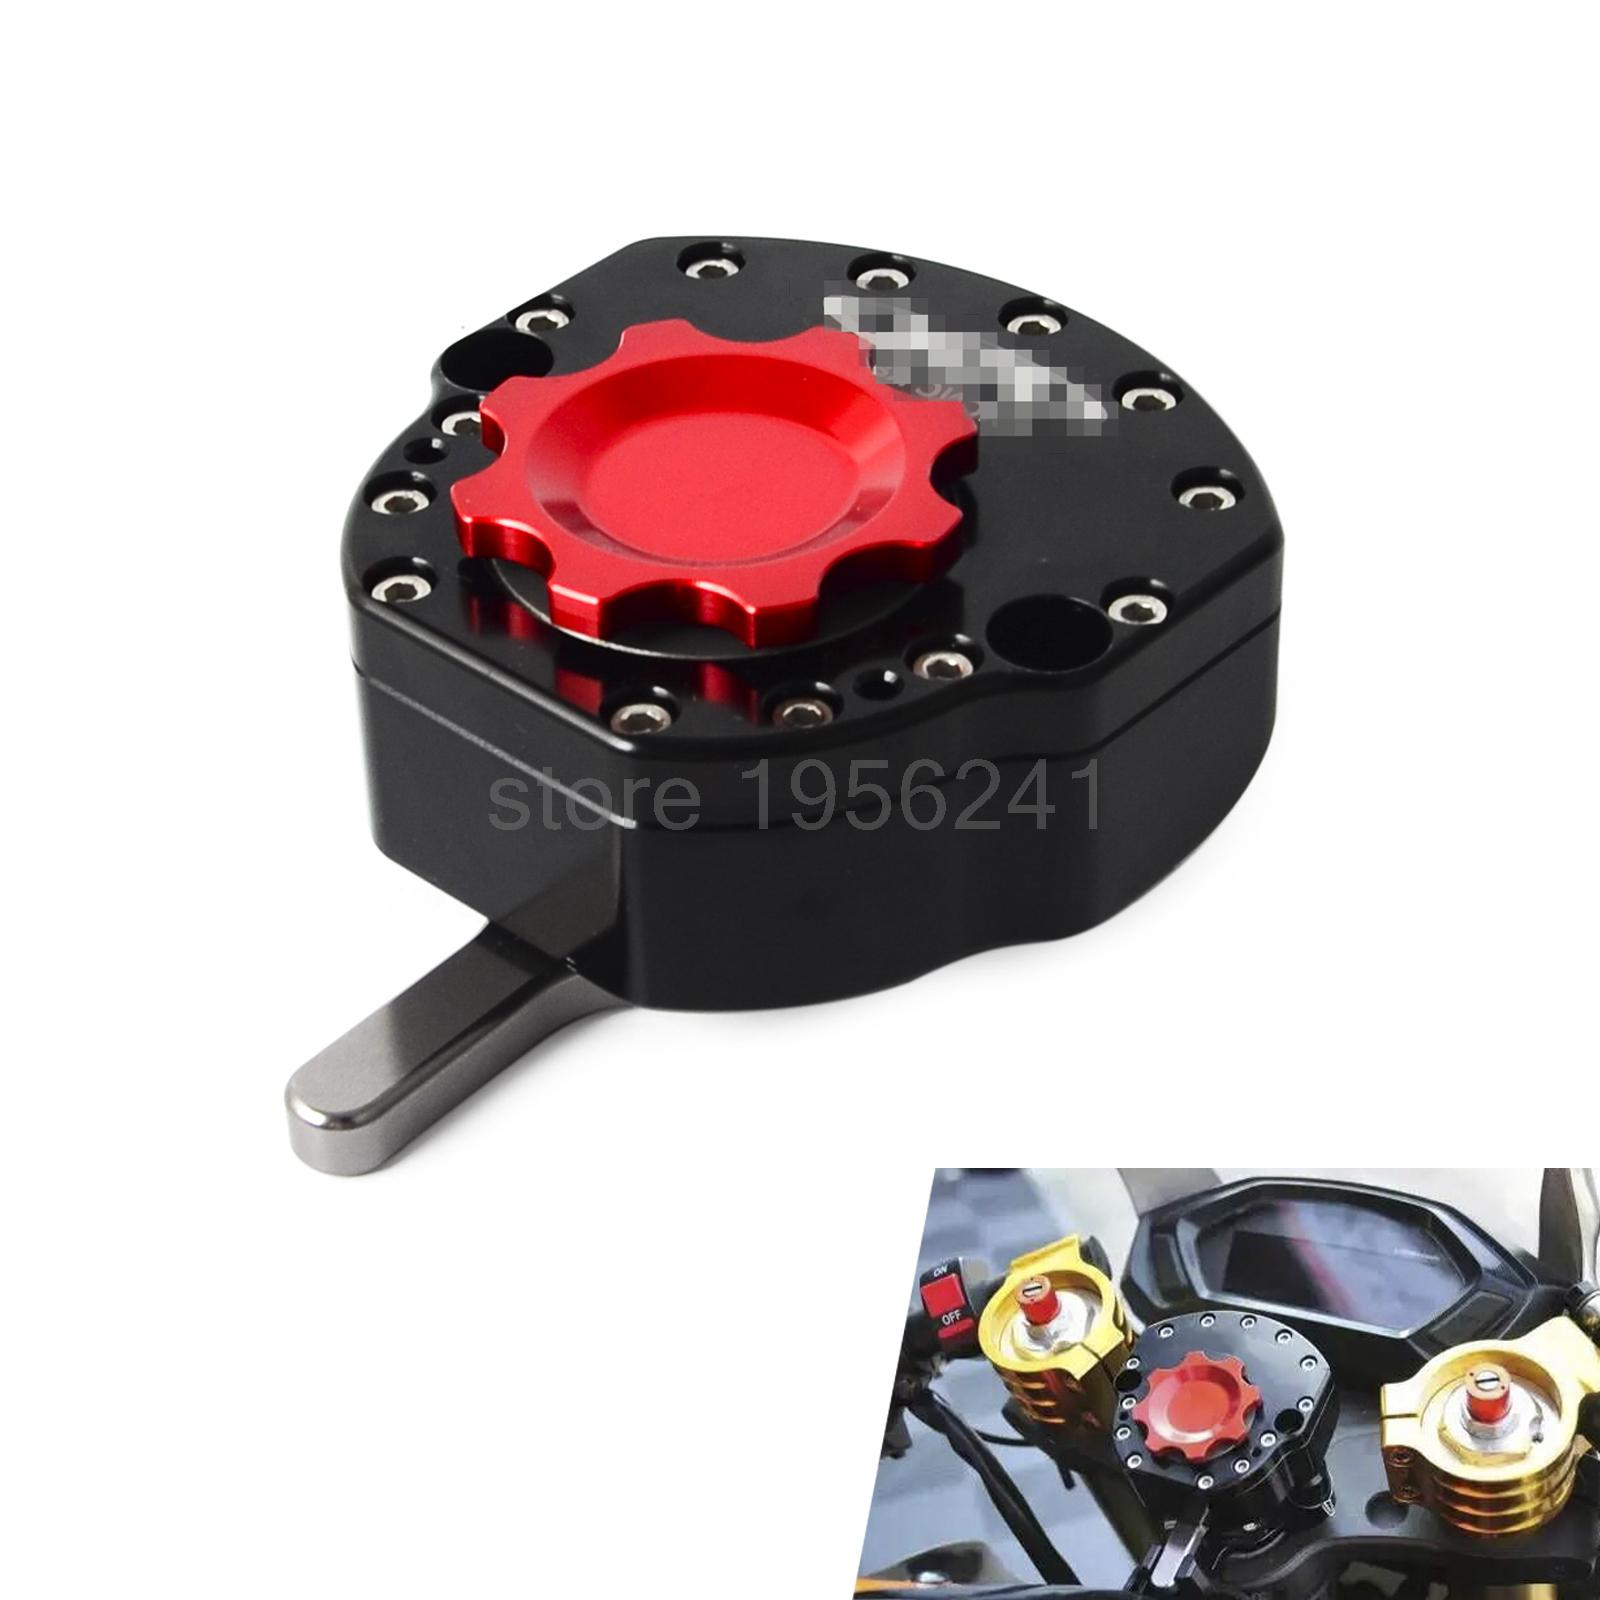 CNC Steering Stabilizer Damper For Kawasaki ZX14R ZX-14R 06-12 Honda CB1000 2011 CBR929RR CBR954RR 00-03 Buell 1125R 1125CR